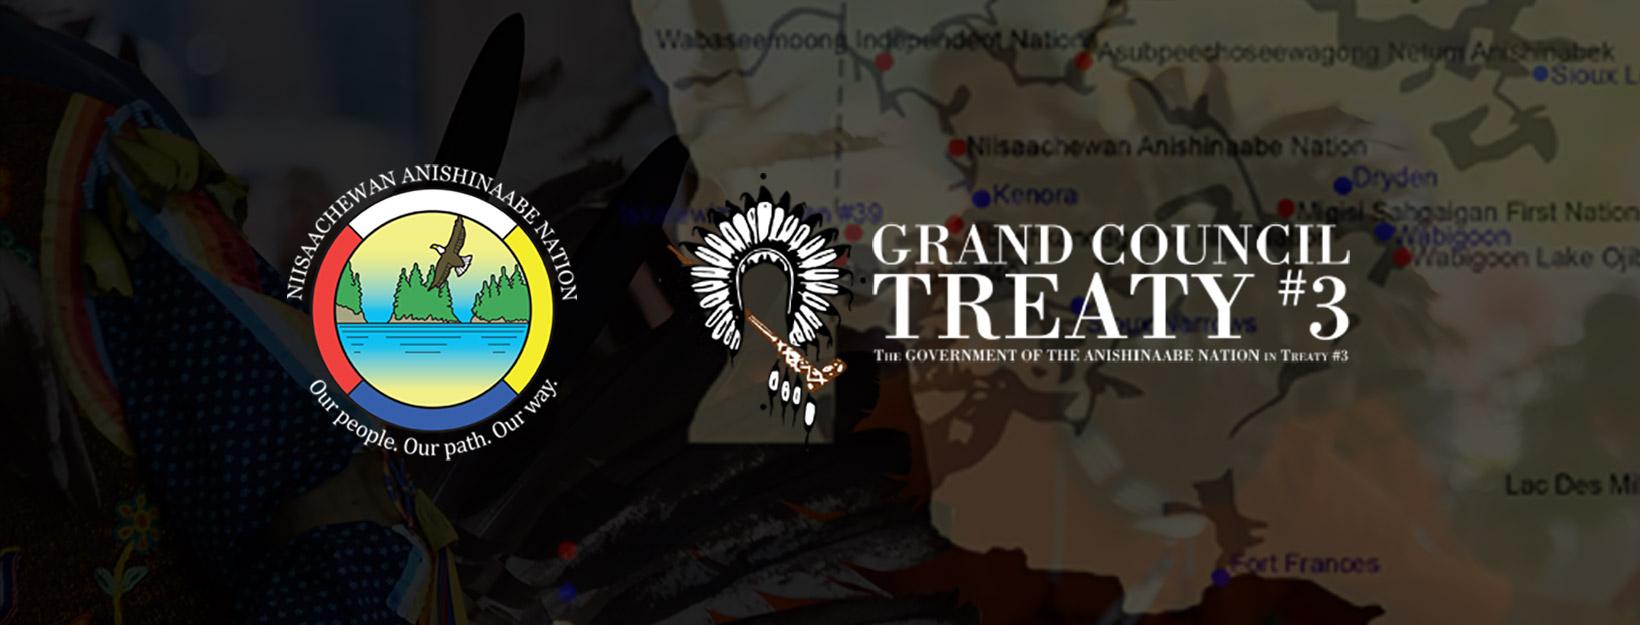 Niisaachewan Anishinaabe Nation & Grand Council Treaty #3 Logo